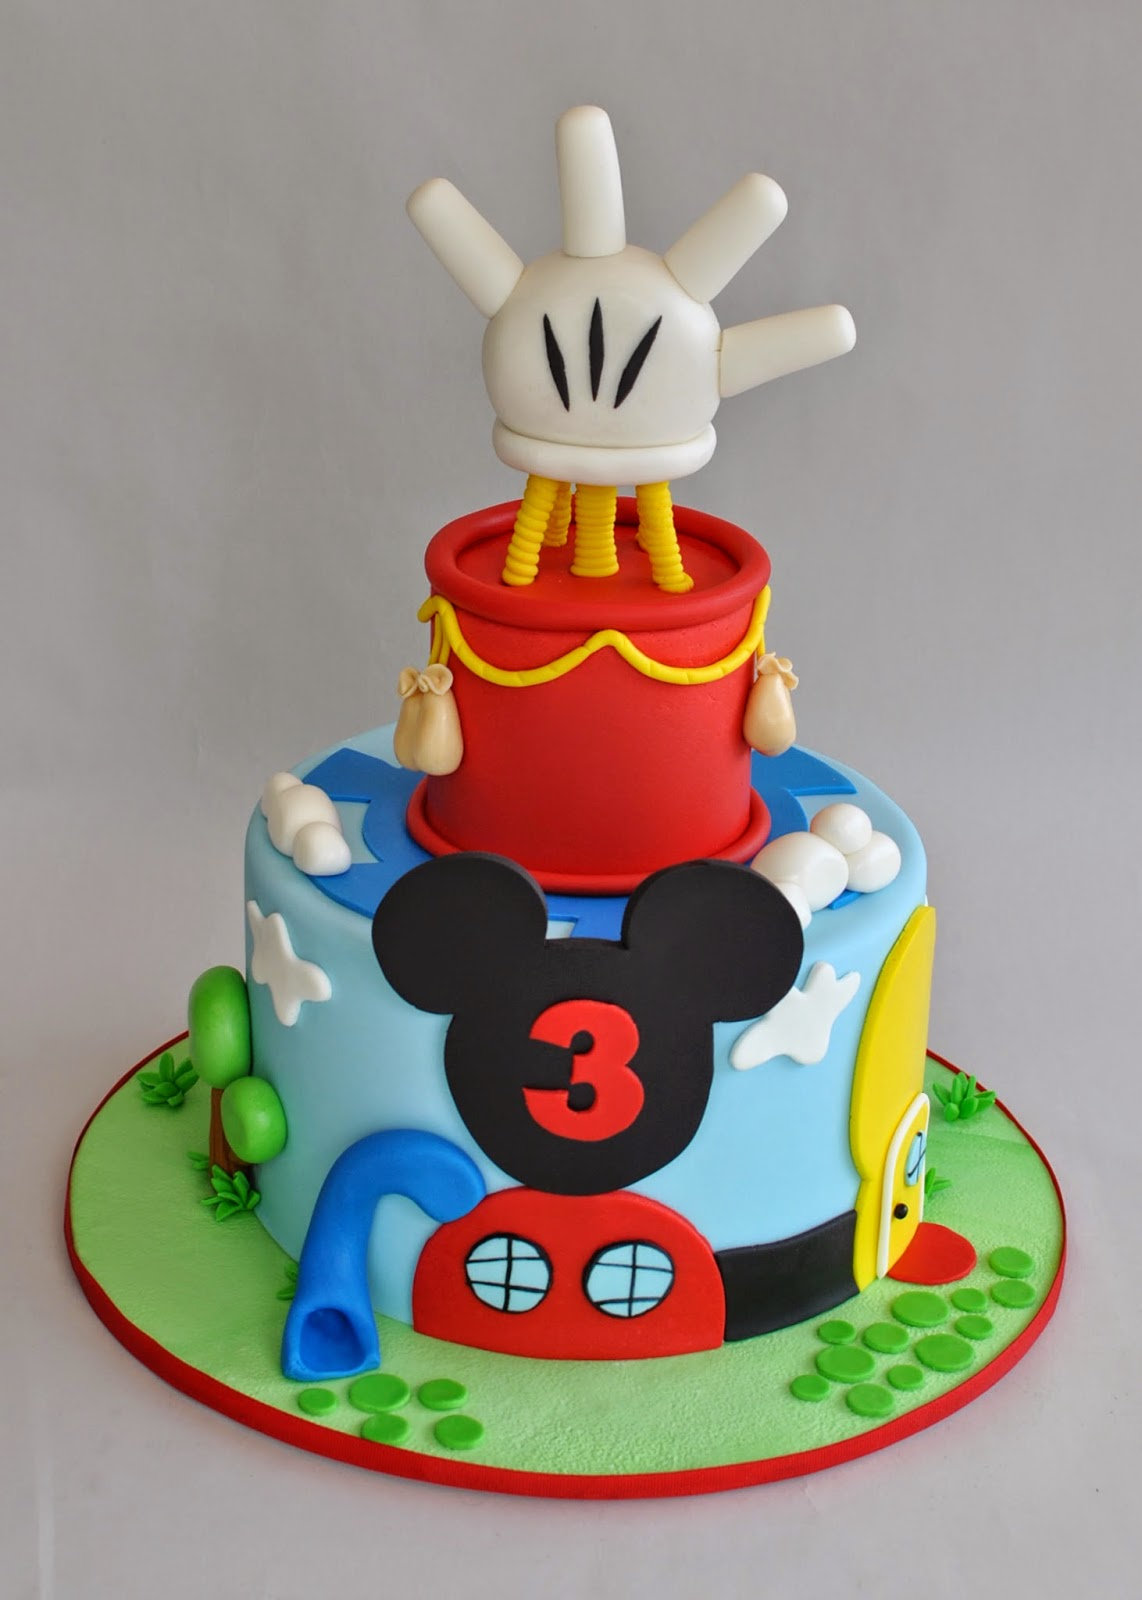 Mickey Mouse Cake Birmingham